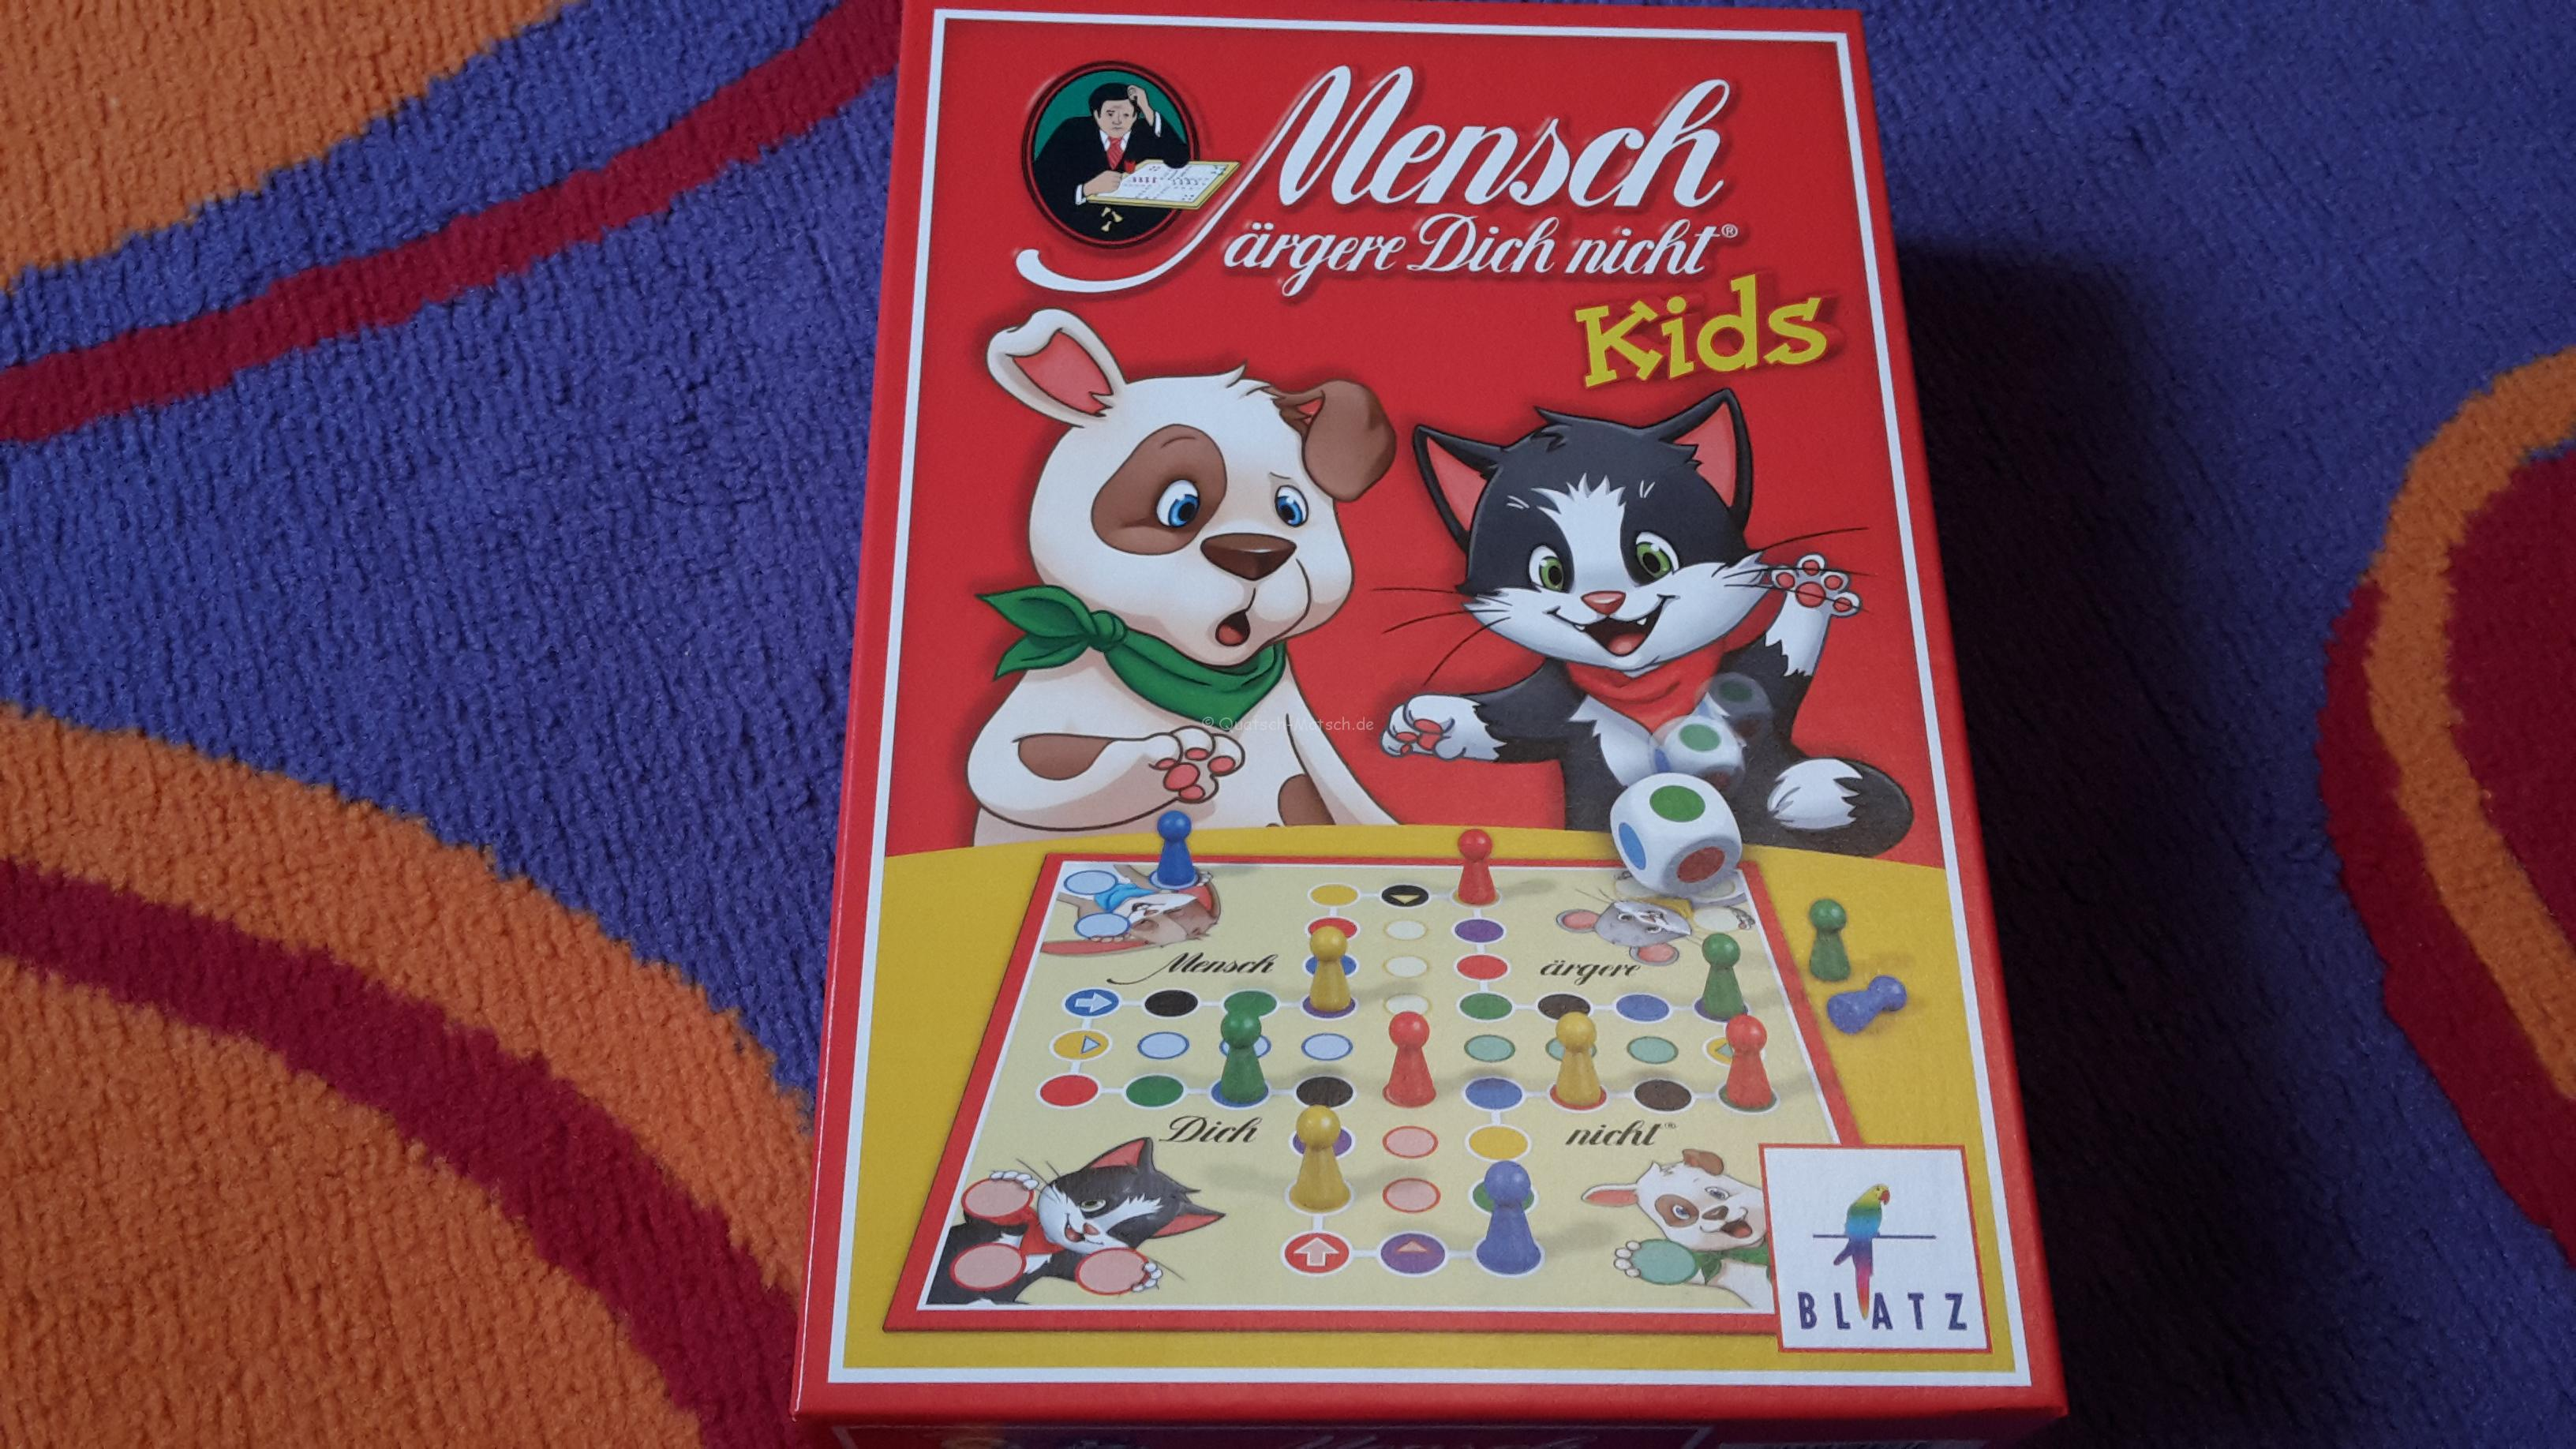 Mensch ärgere Dich nicht Kids – Spieletest